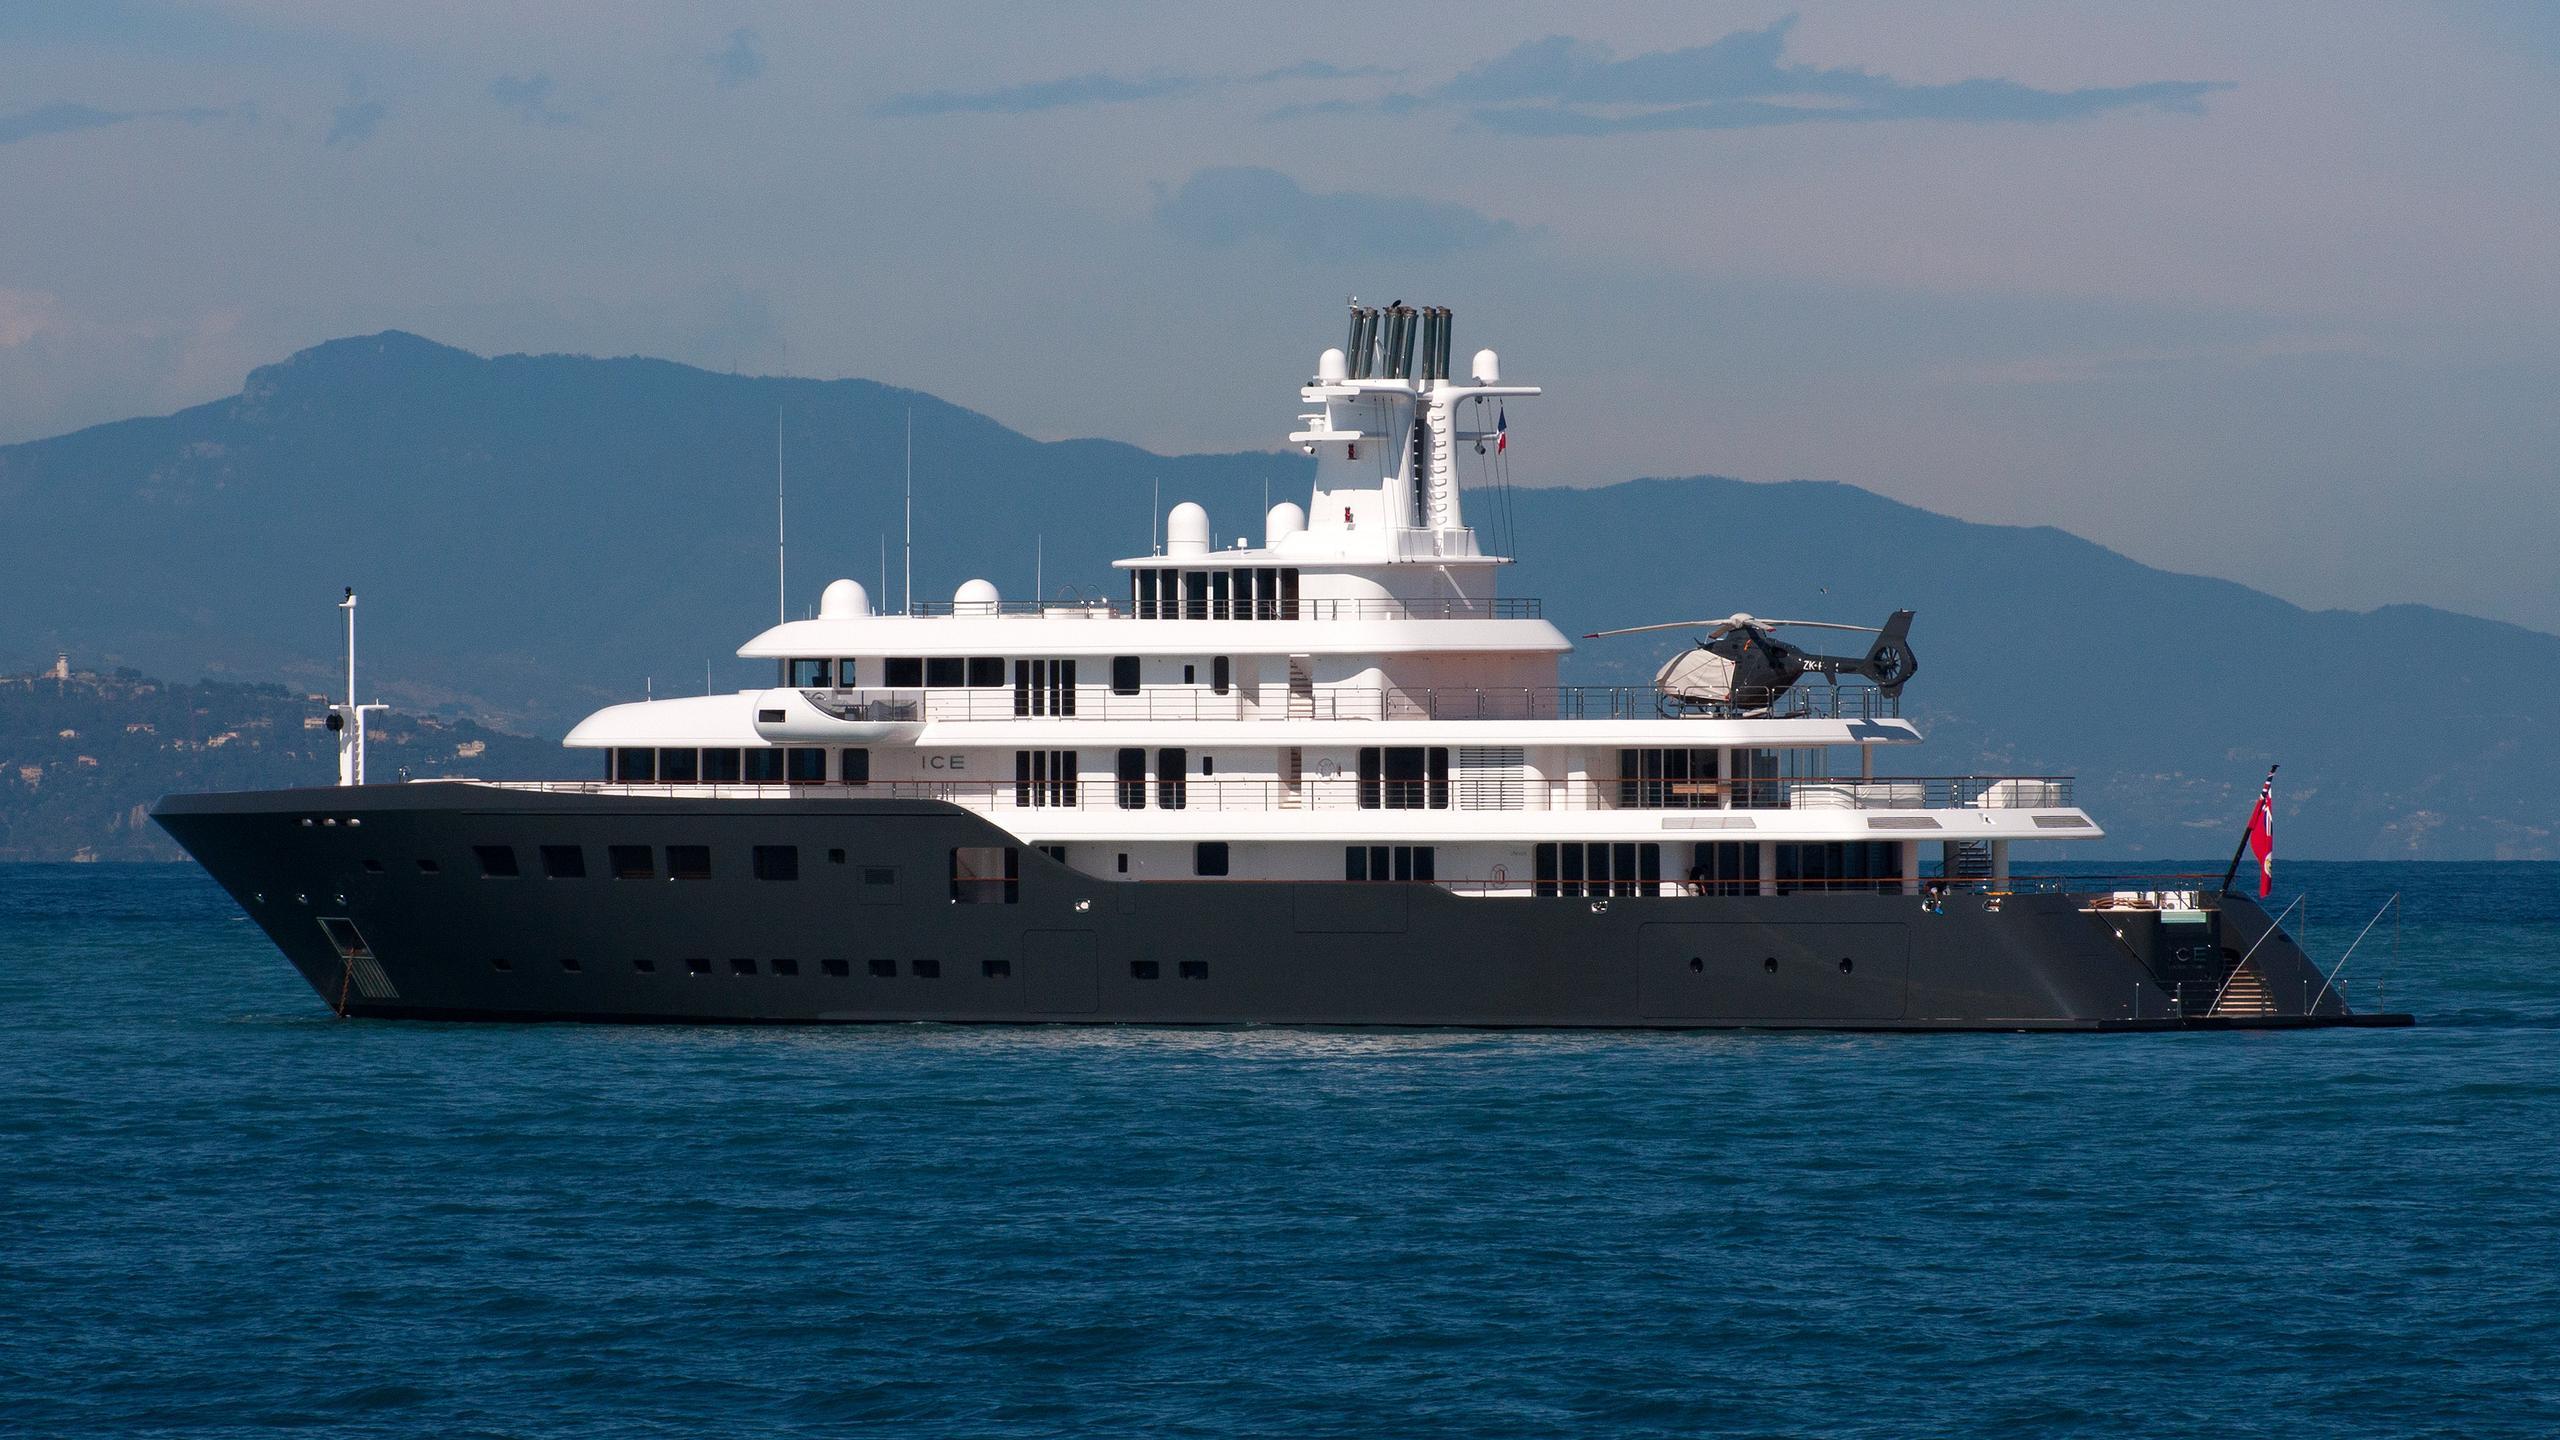 ice-explorer-yacht-lurssen-2005-90m-profile